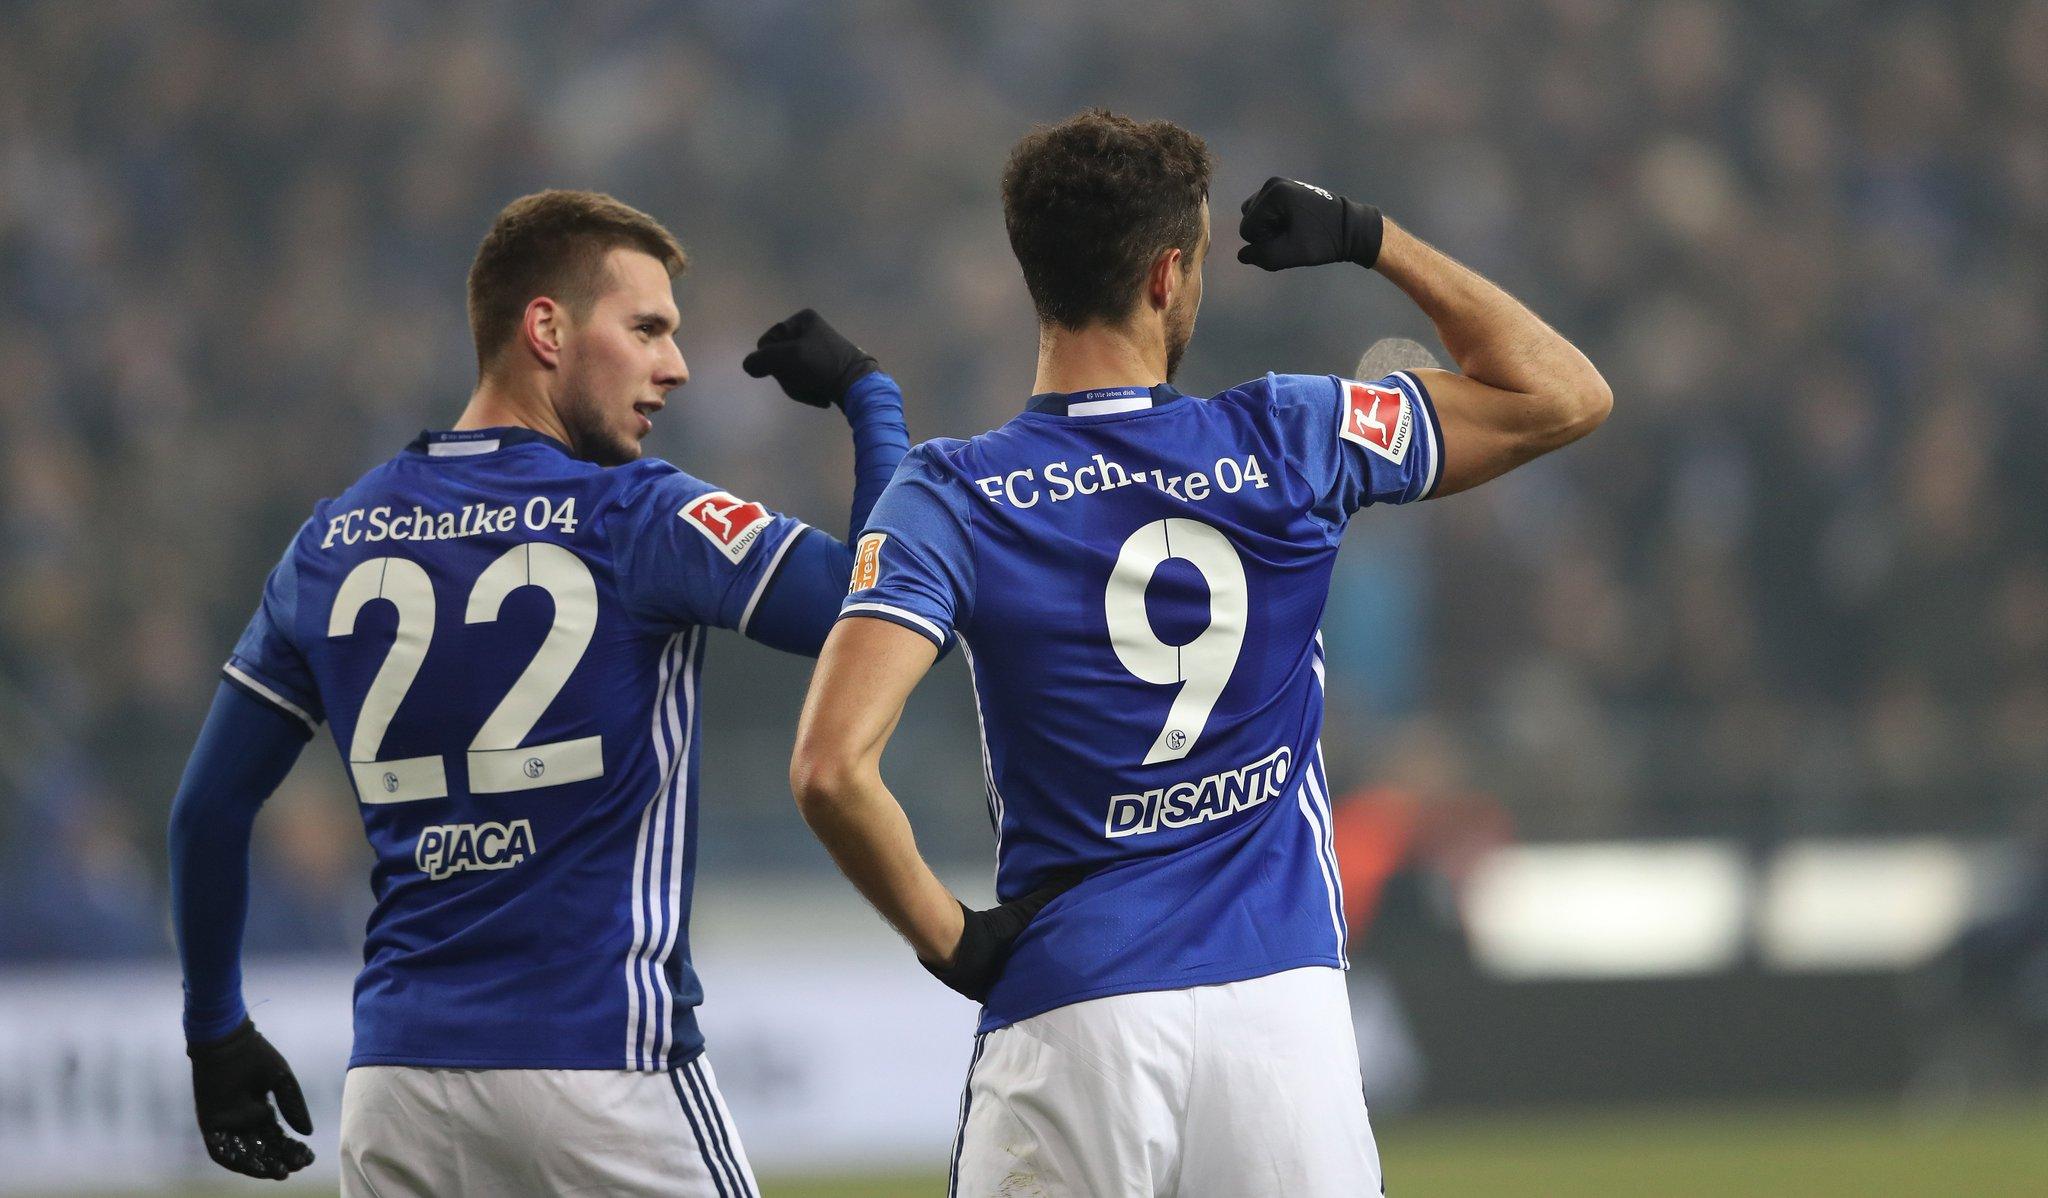 Schalke 04 vs Herhta BSC Highlights & Goals Video - 3 March 2018 - Bundesliga